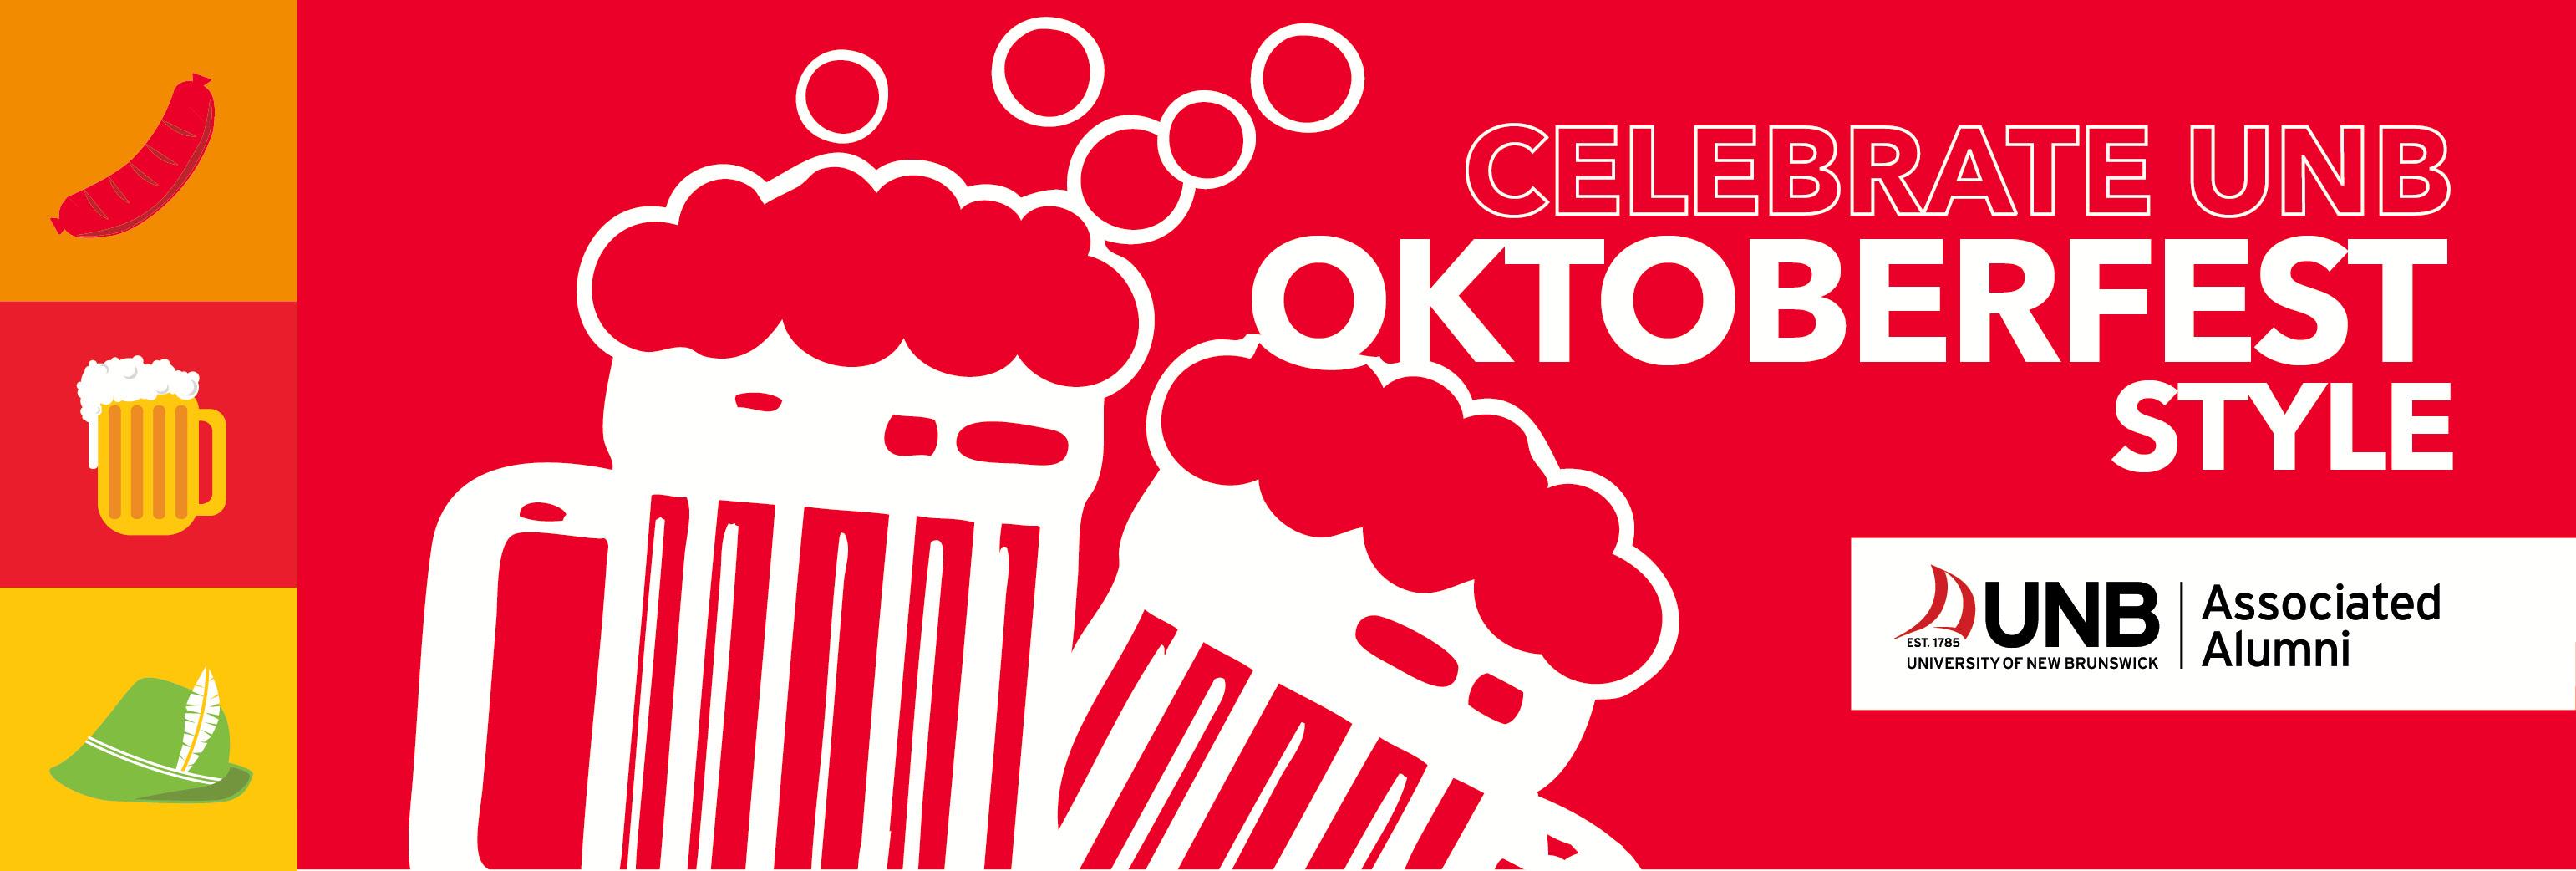 Celebrate UNB: Oktoberfest Style 2017